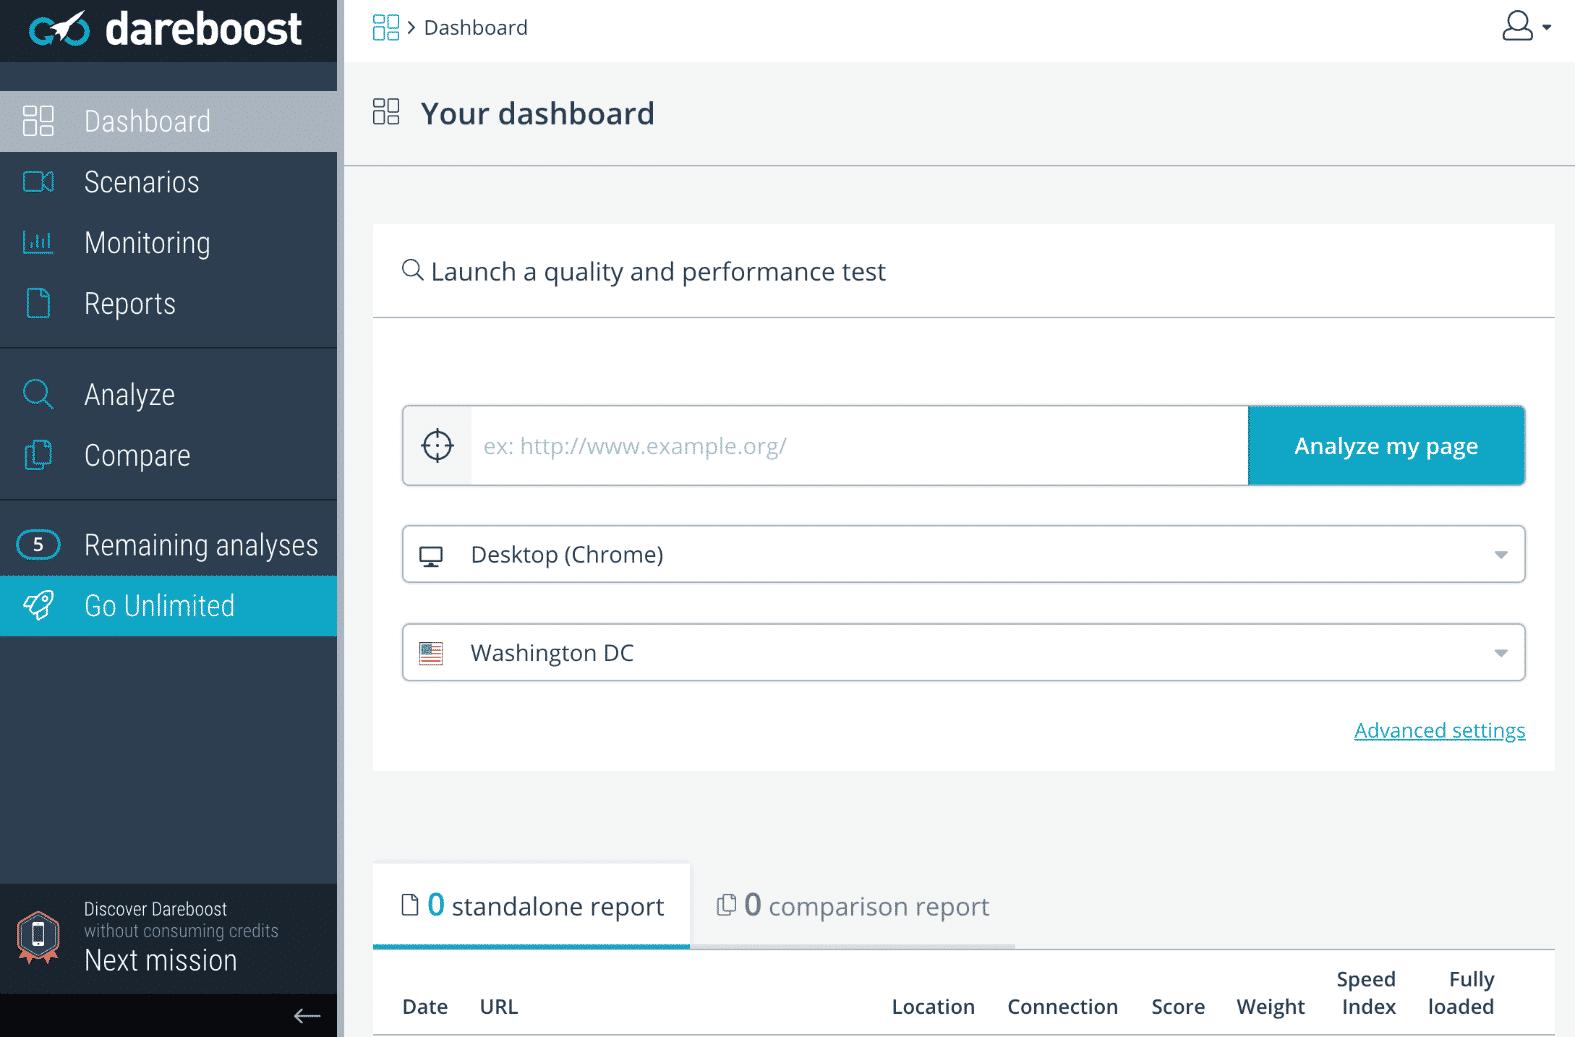 DareBoost website snelheidstest hulpmiddel